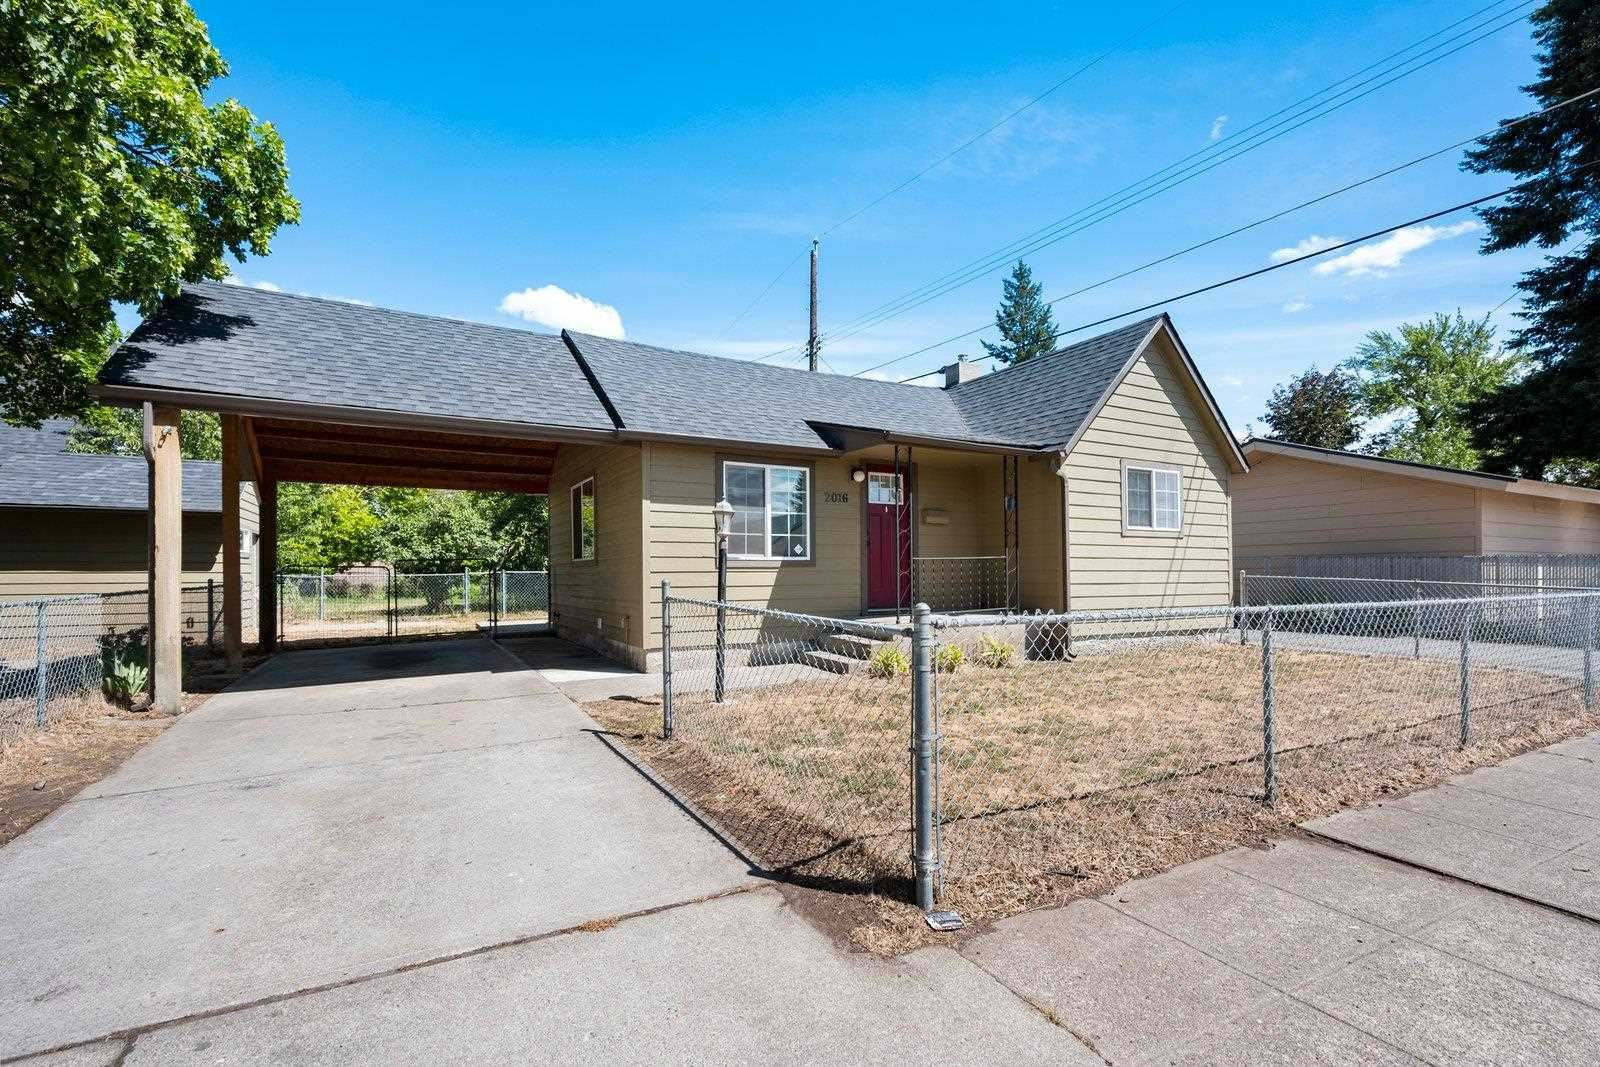 2016 N Elm St, Spokane, WA 99205-4131 - #: 202116862